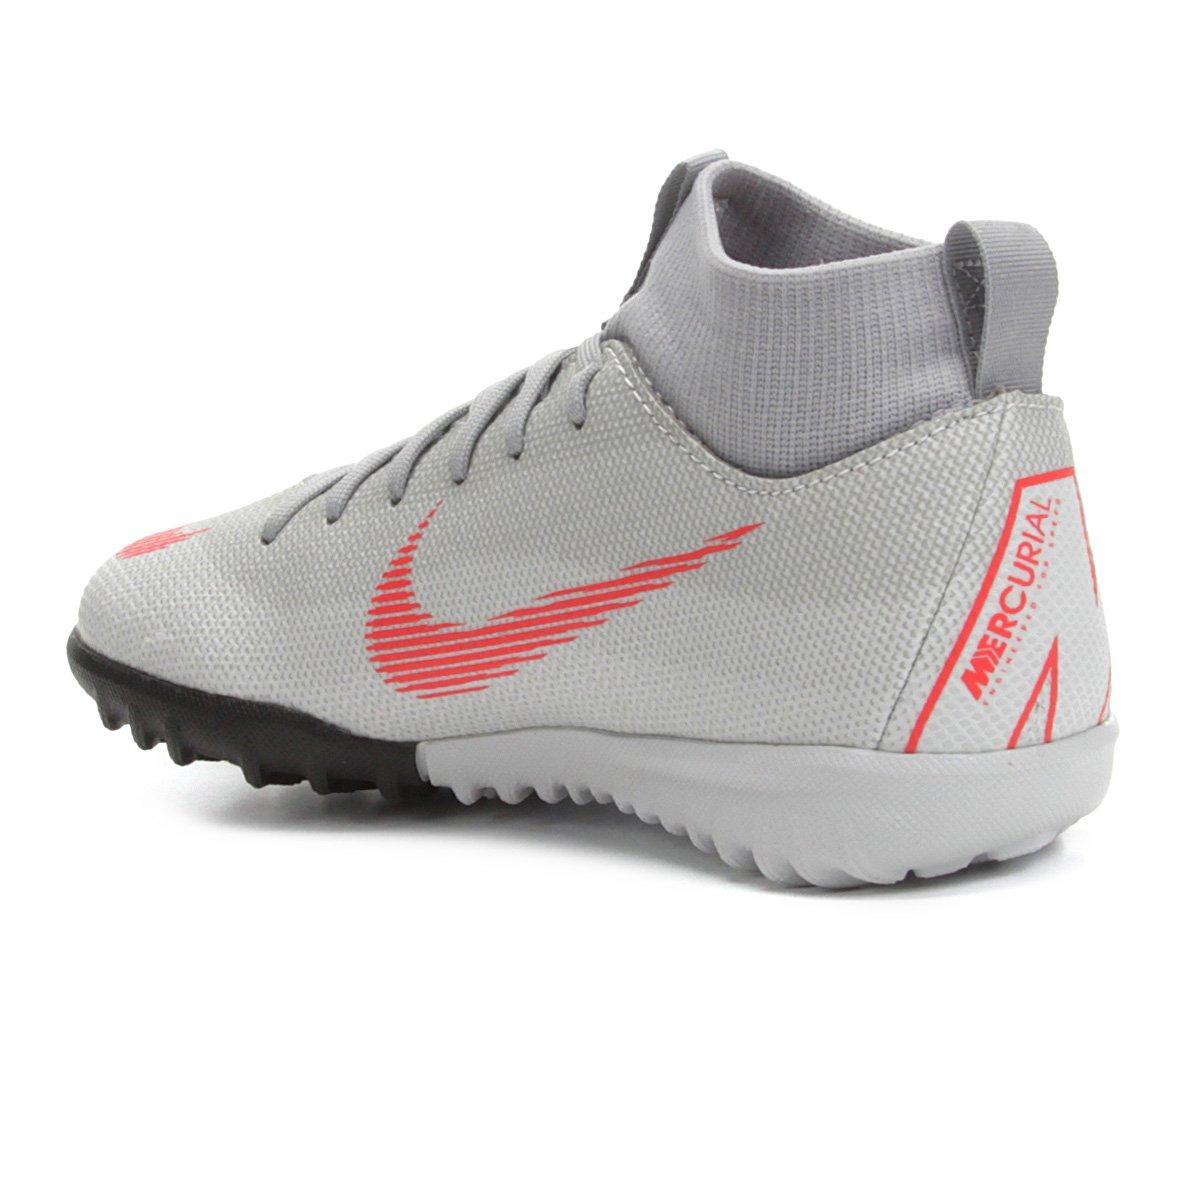 31fe3779e1 ... Chuteira Society Infantil Nike Mercurial Superfly 6 Academy GS TF ...